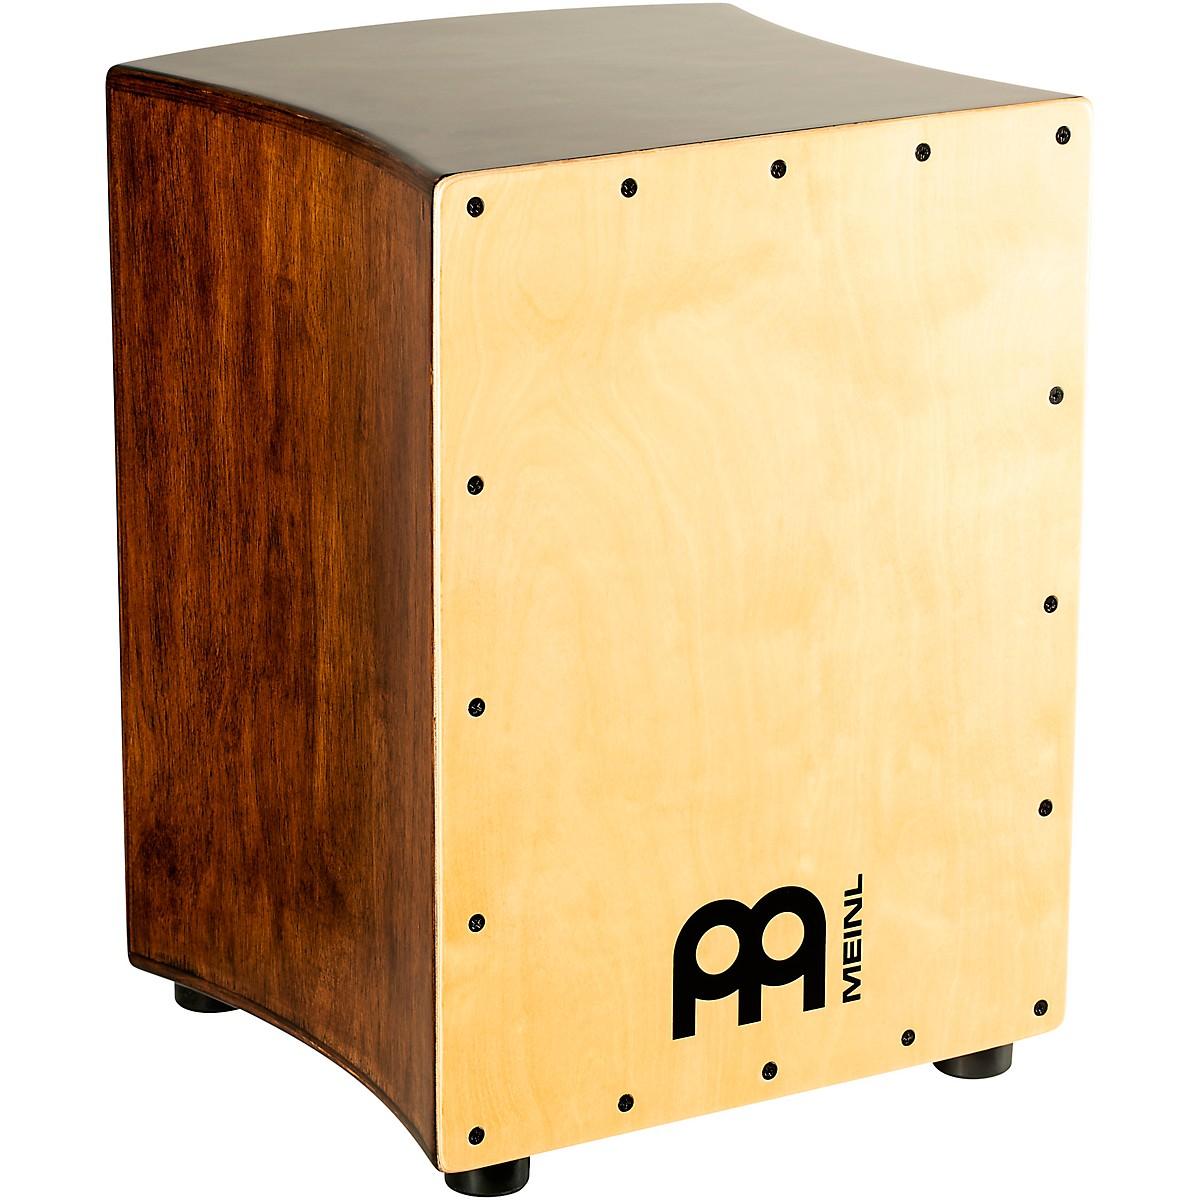 Meinl Ergo Bass Cajon with Maple Frontplate